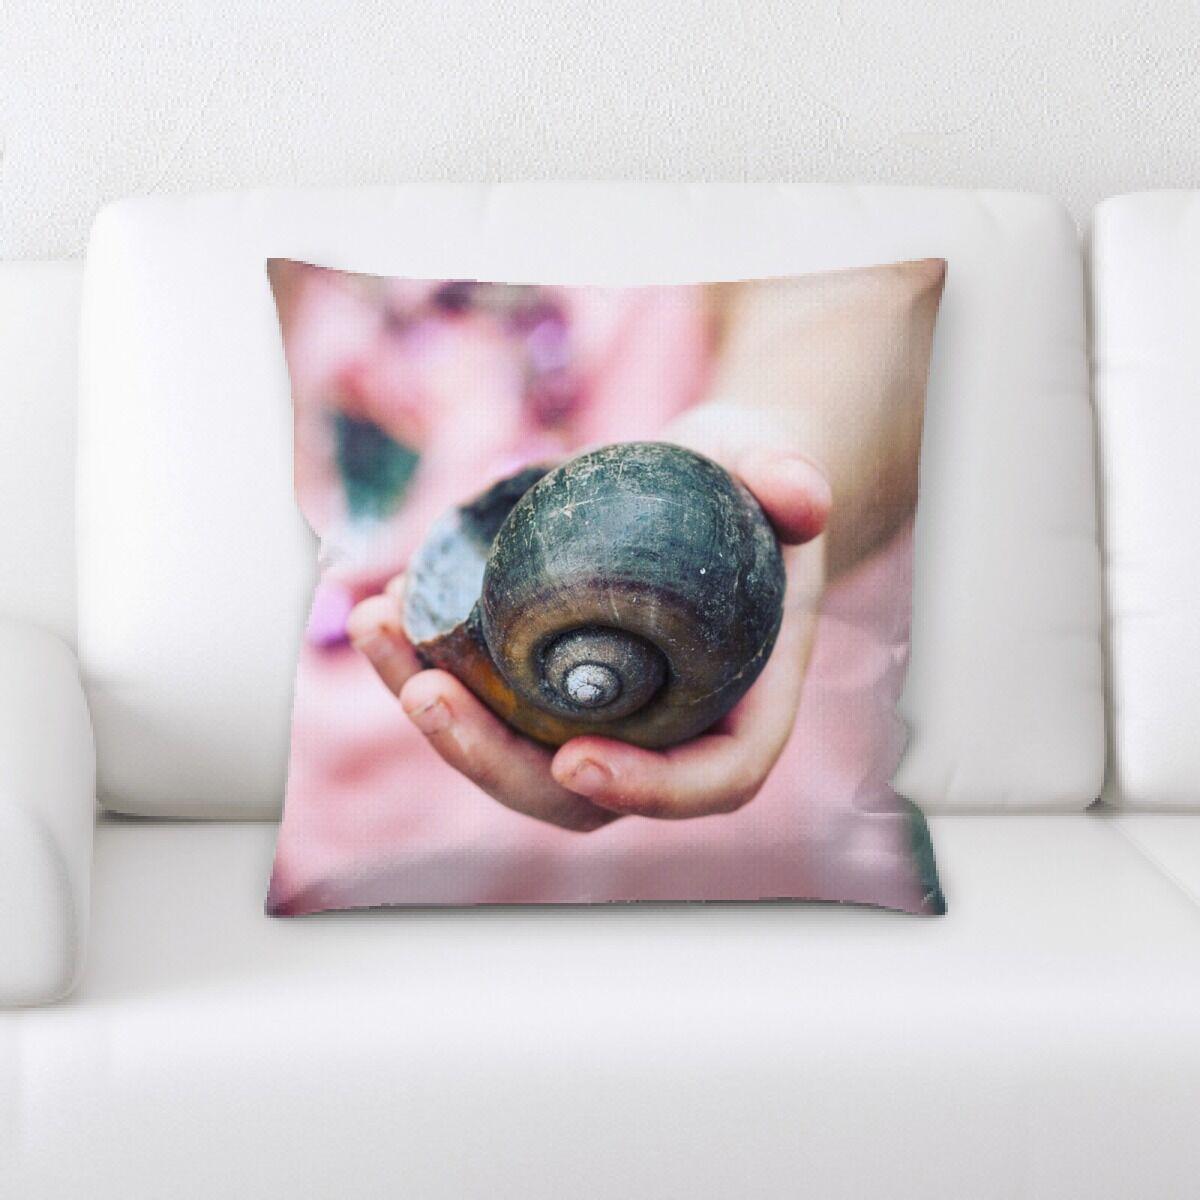 Farrar Meditation and Calming Moments (37) Throw Pillow